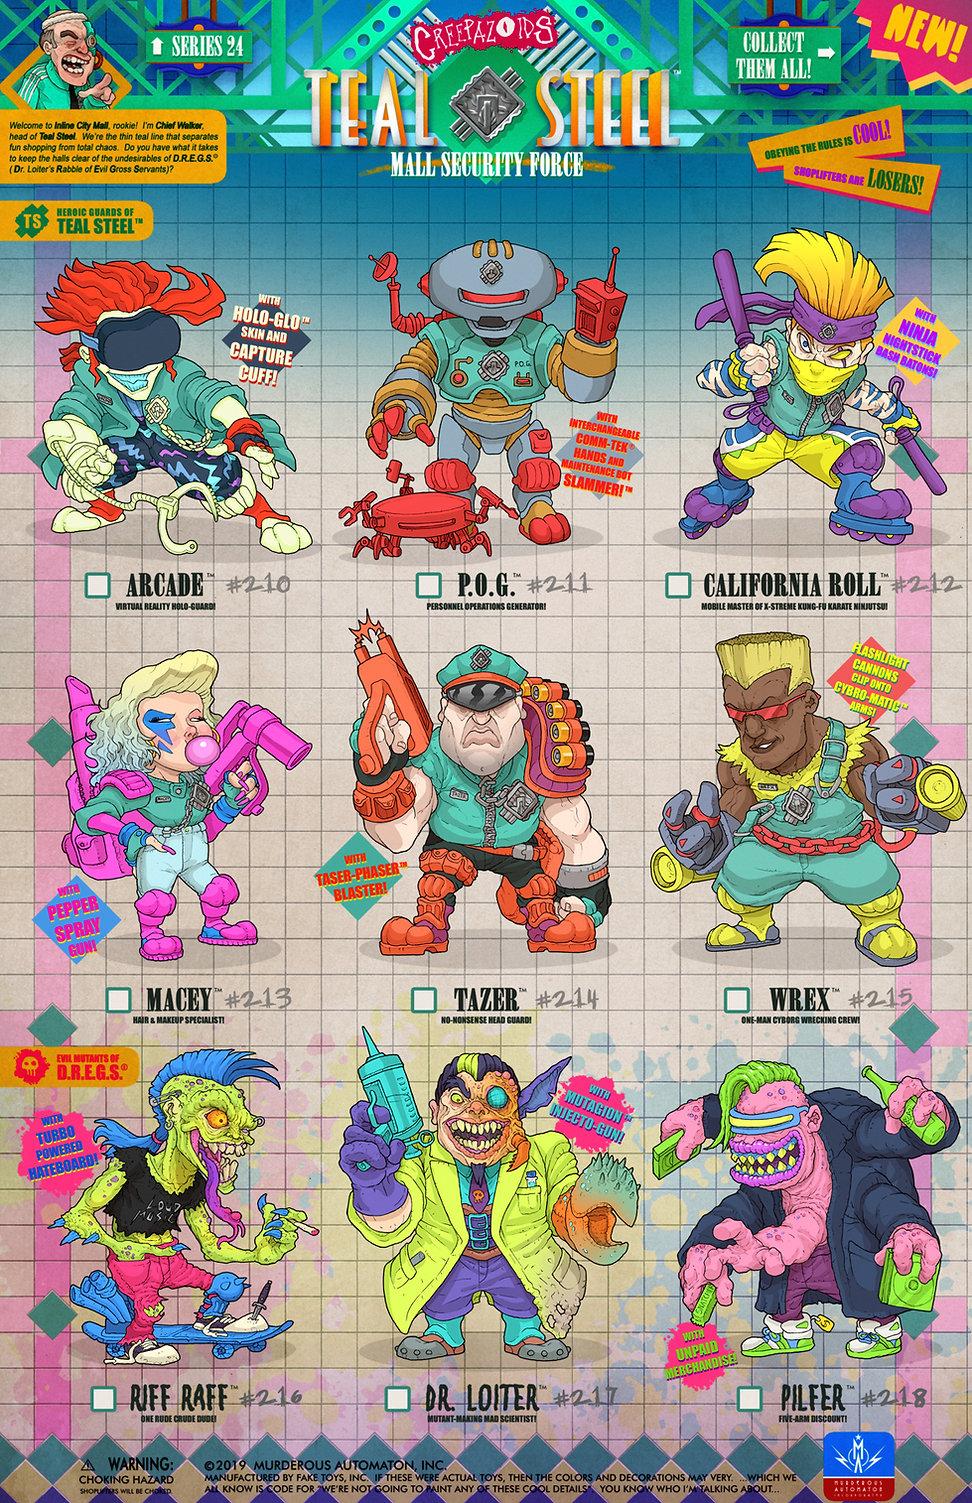 24 Creepazoids--Teal Steel.jpg